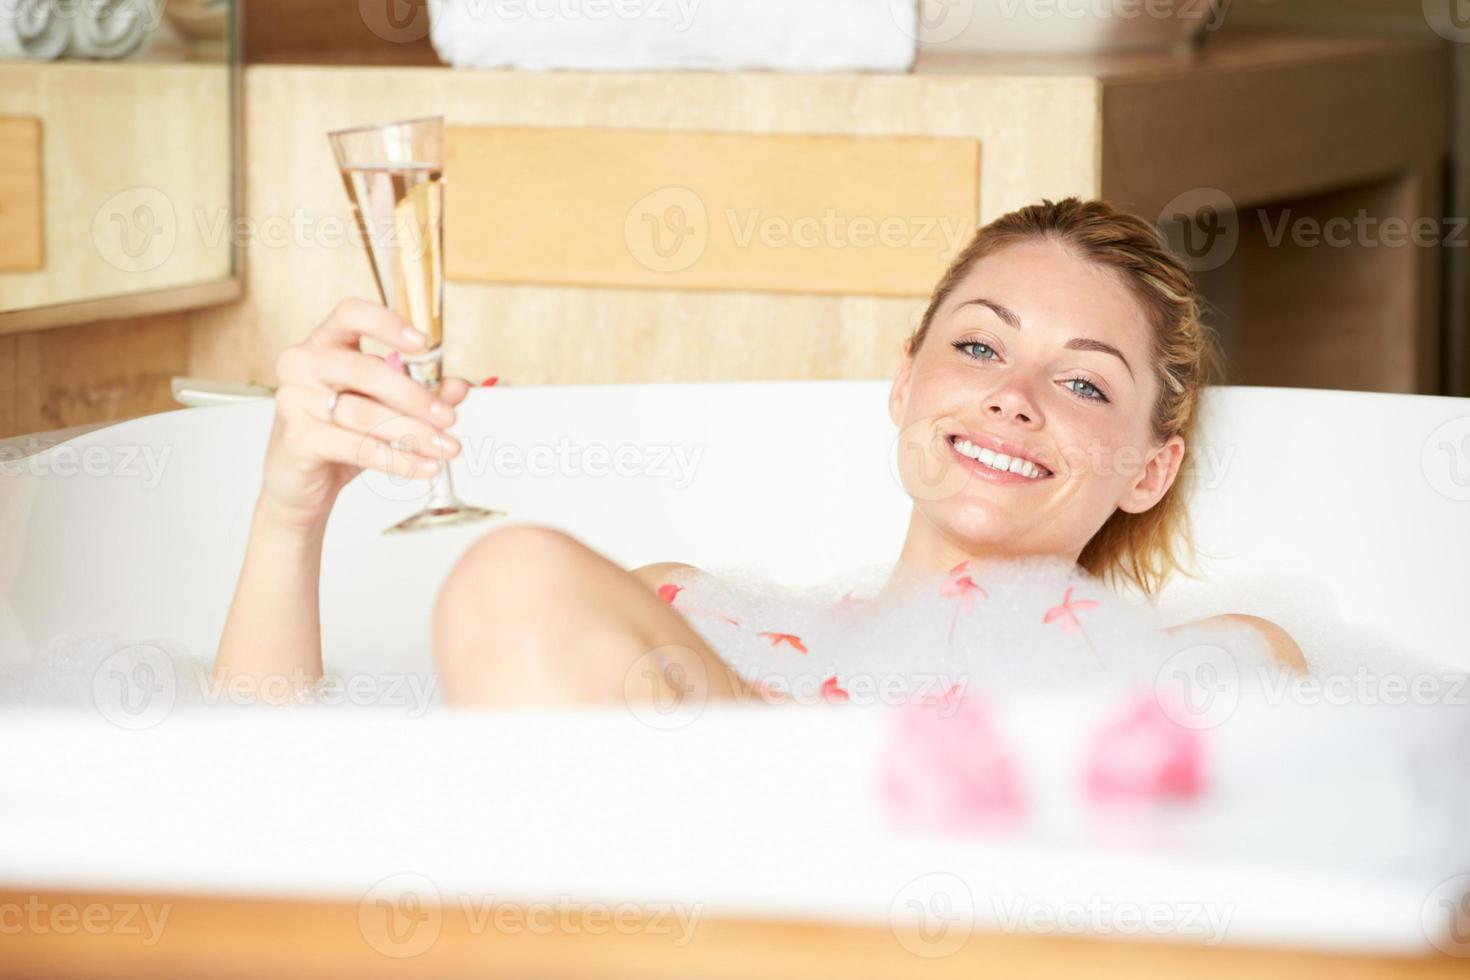 kvinna kopplar av i badet dricker champagne foto